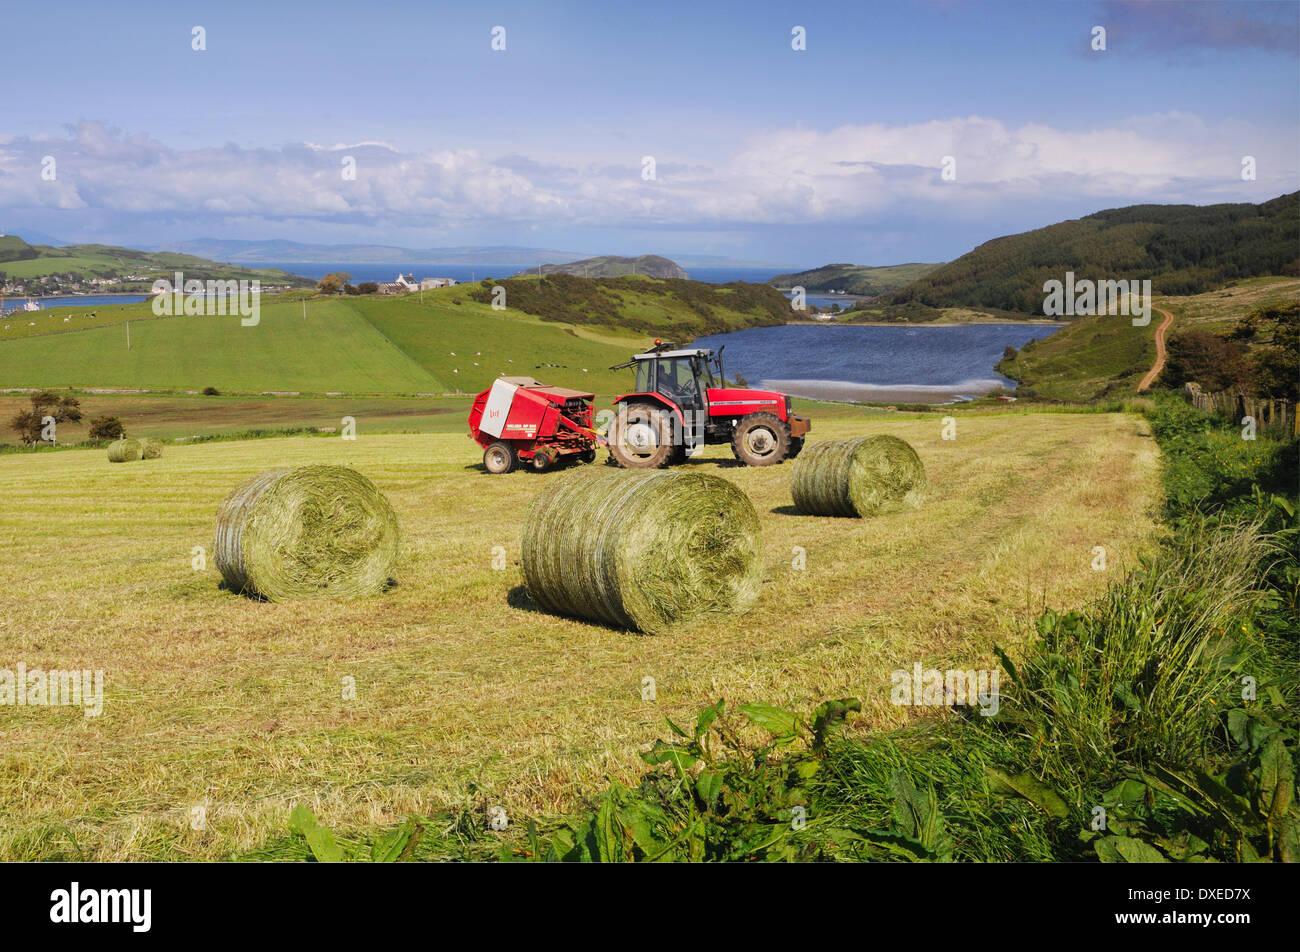 La agricultura fuera de Campbeltown,, Argyll Kintyre Imagen De Stock